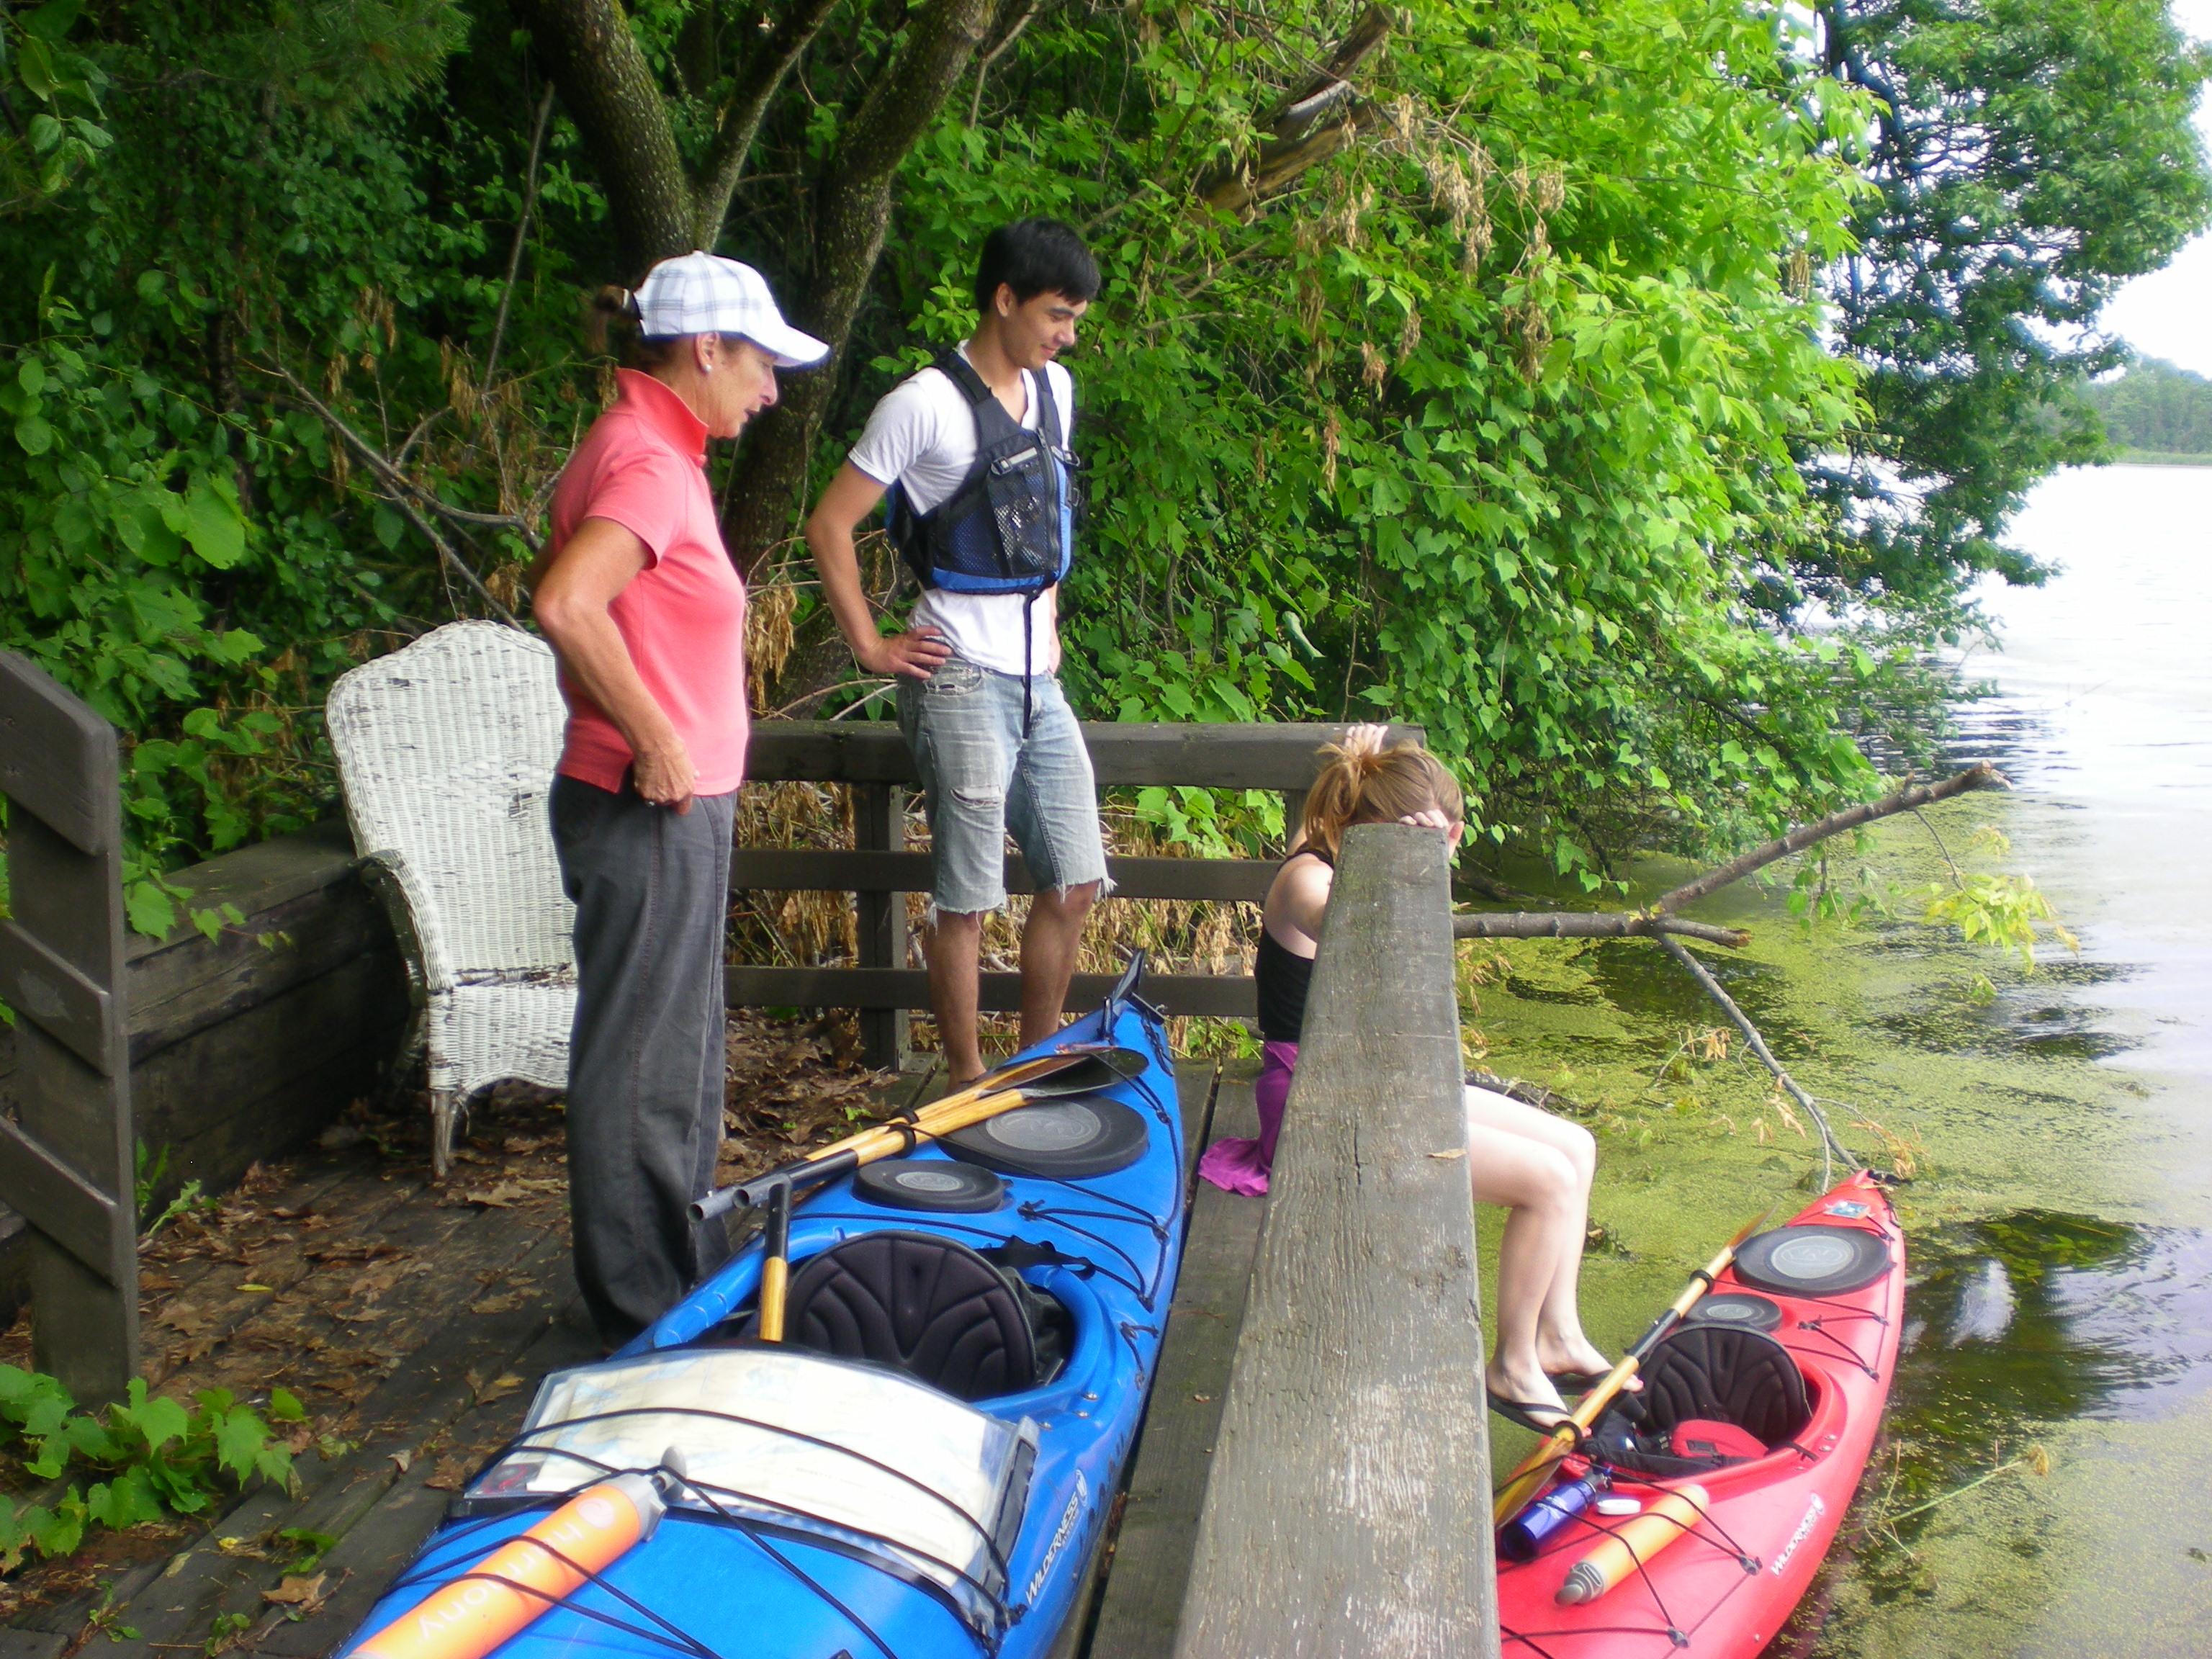 Image of people standing over kayaks.